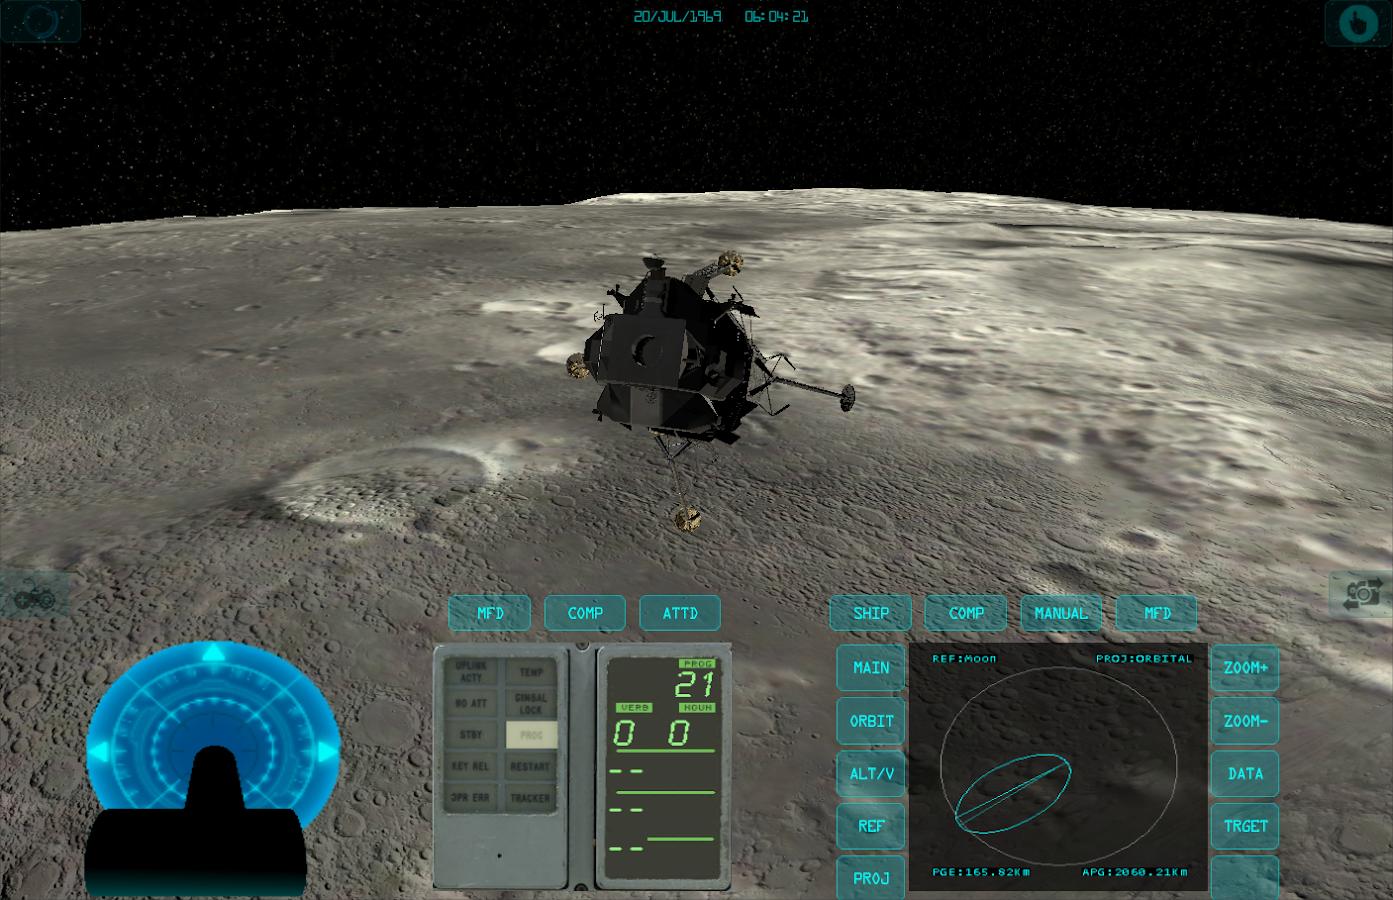 space shuttle simulator epcot - photo #36